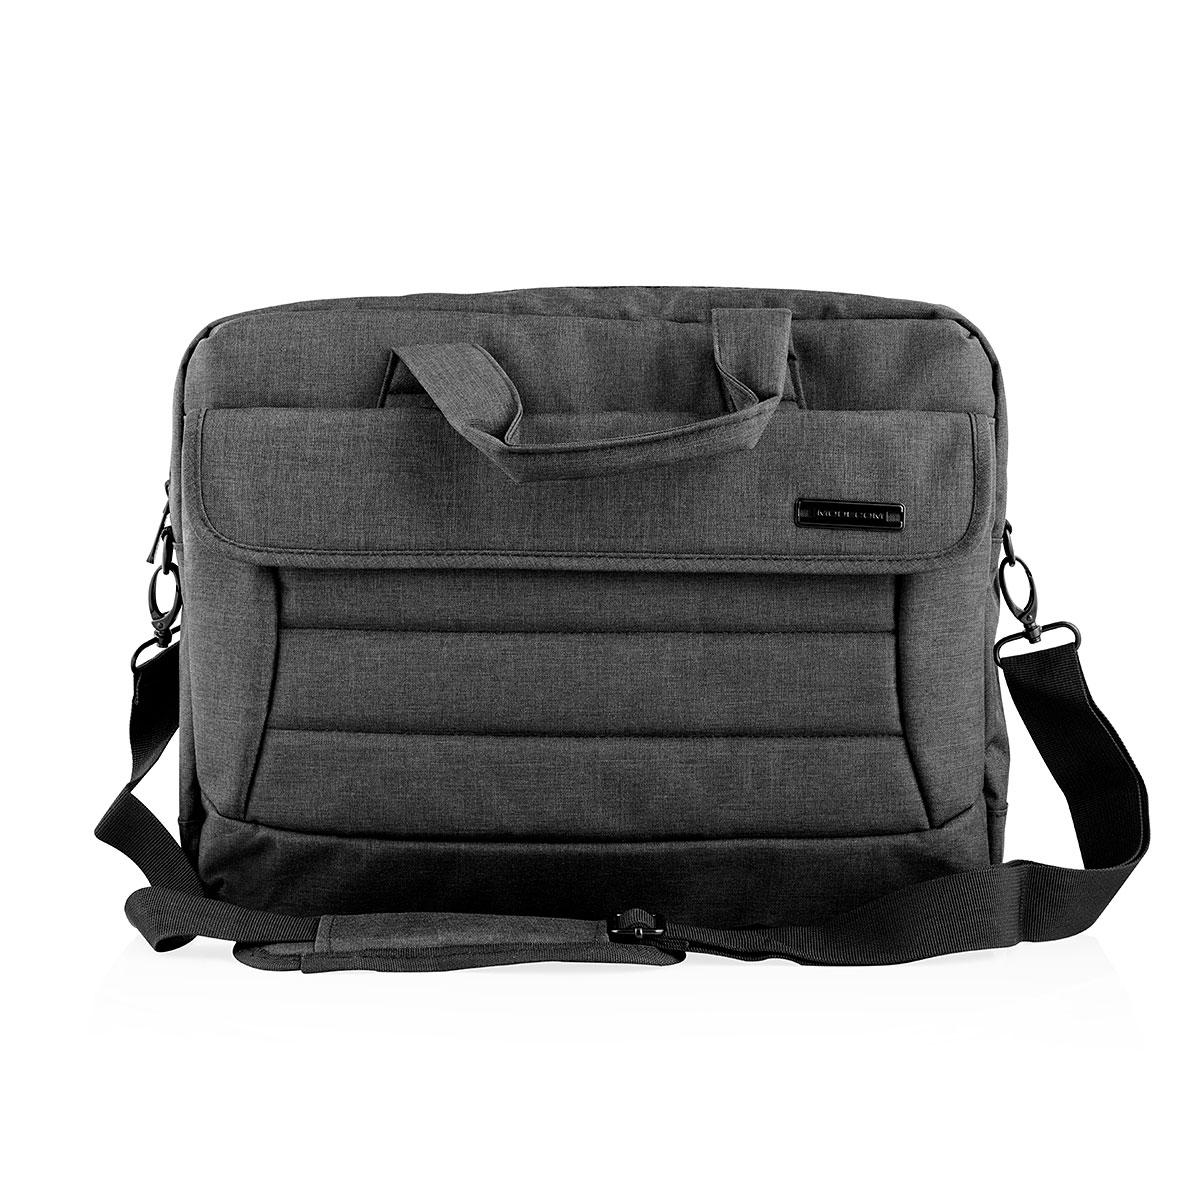 Geanta Laptop Modecom Charlotte 15.6 Negru